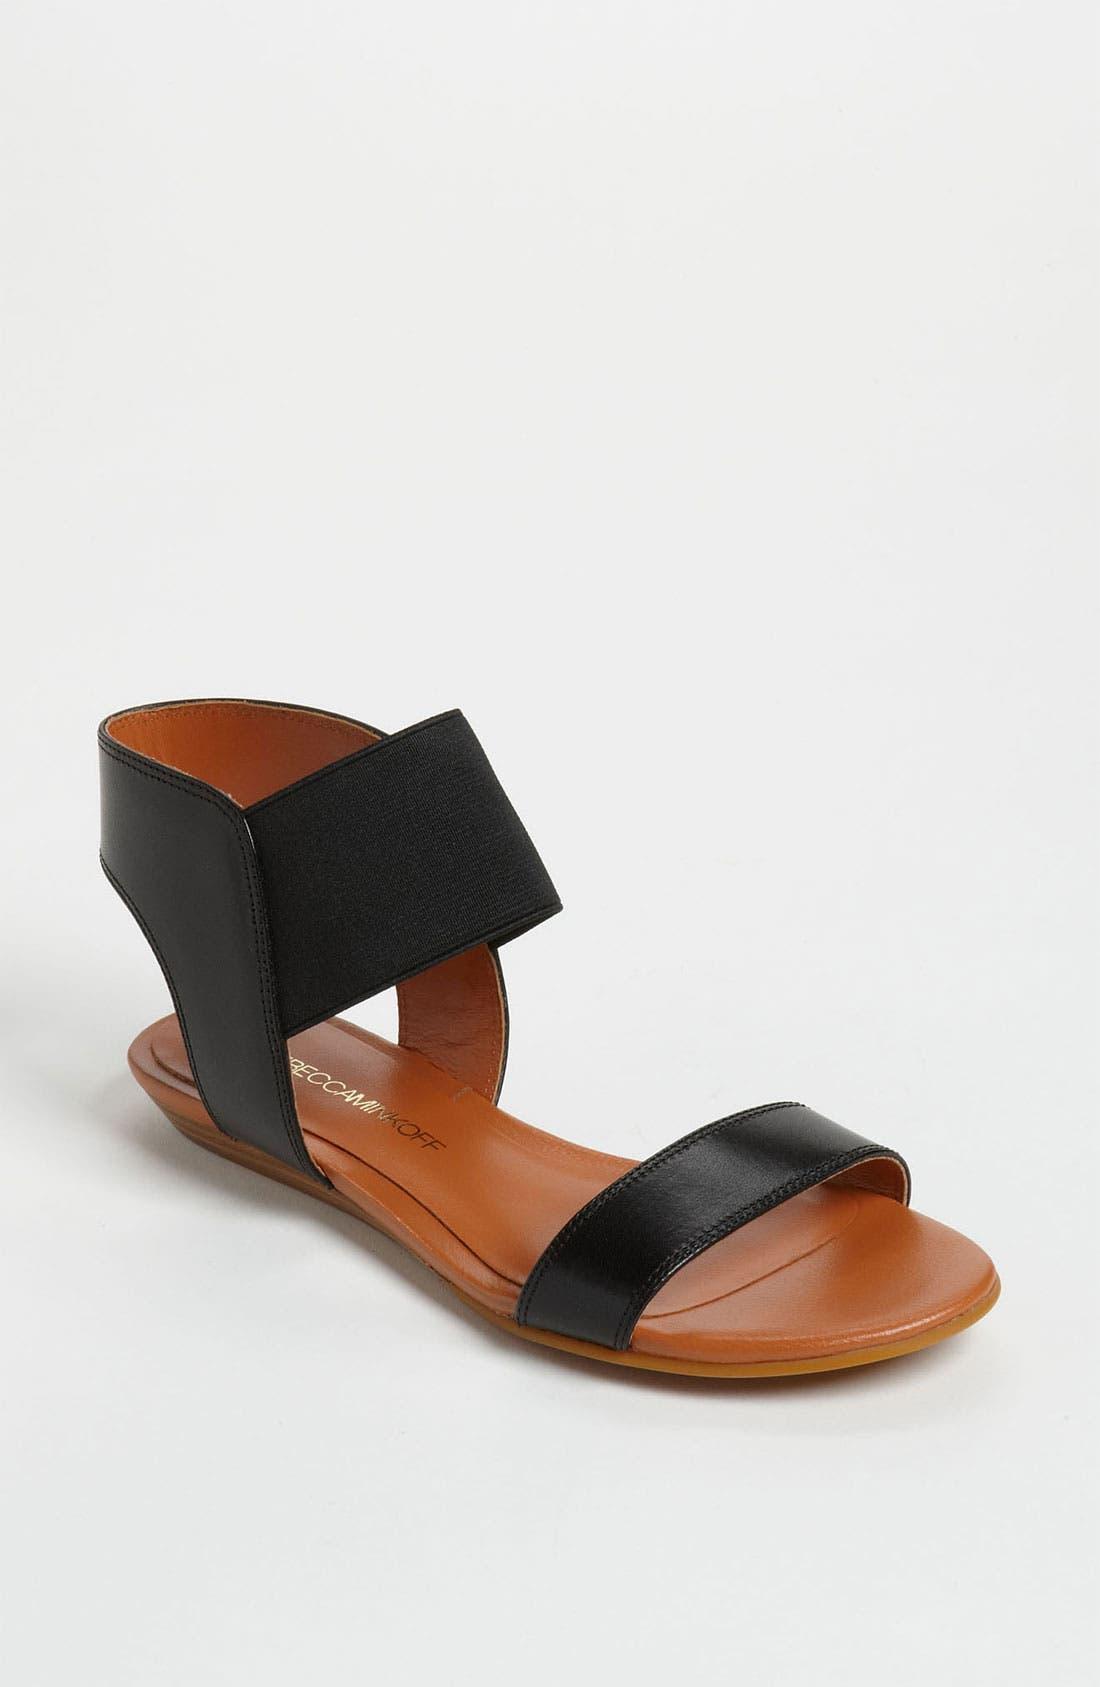 Alternate Image 1 Selected - Rebecca Minkoff 'Bazzle' Sandal (Online Only)